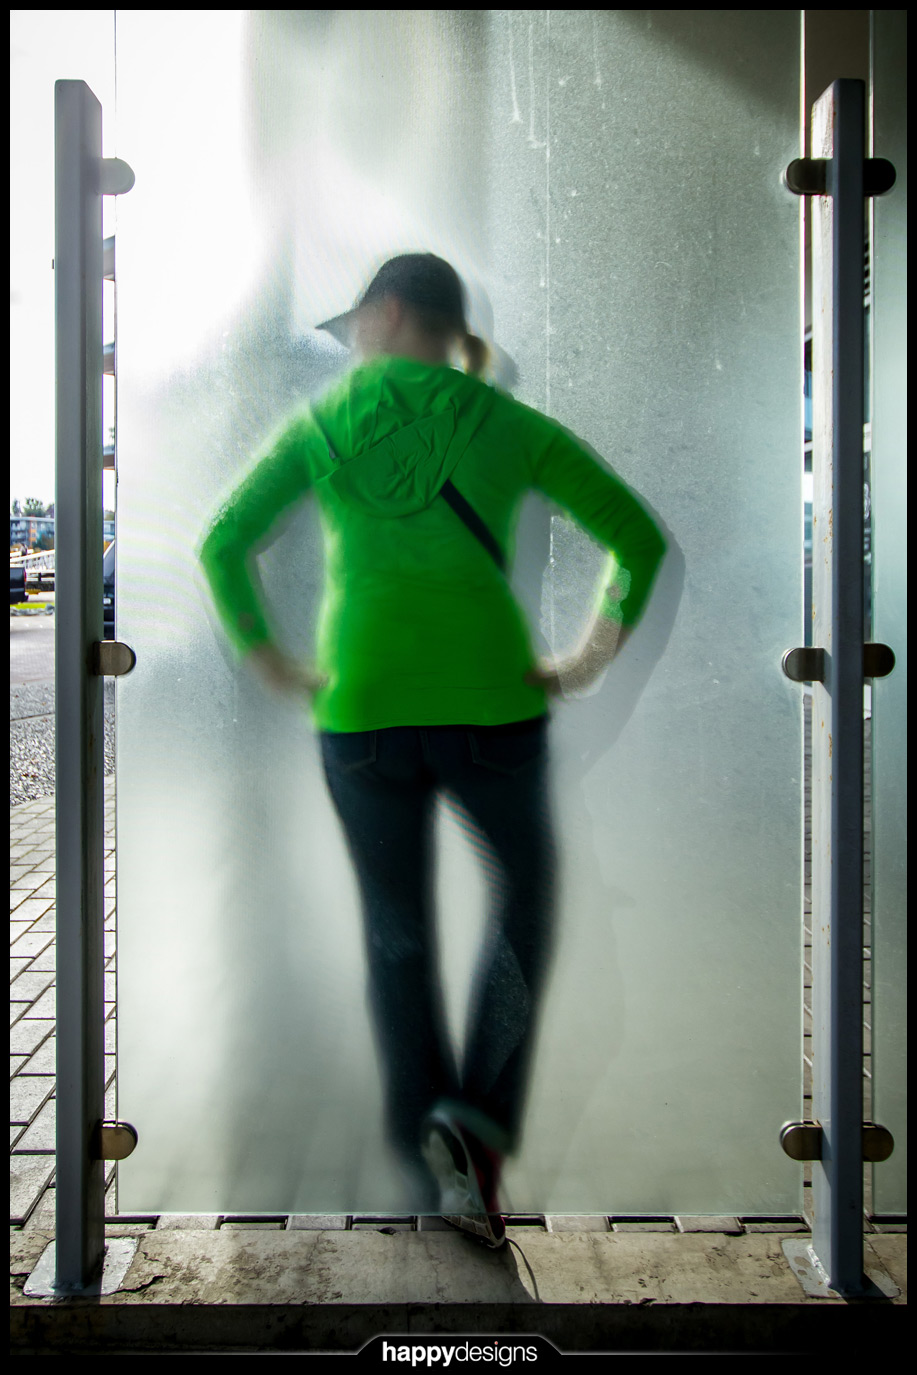 20131008 - Kelby photowalk